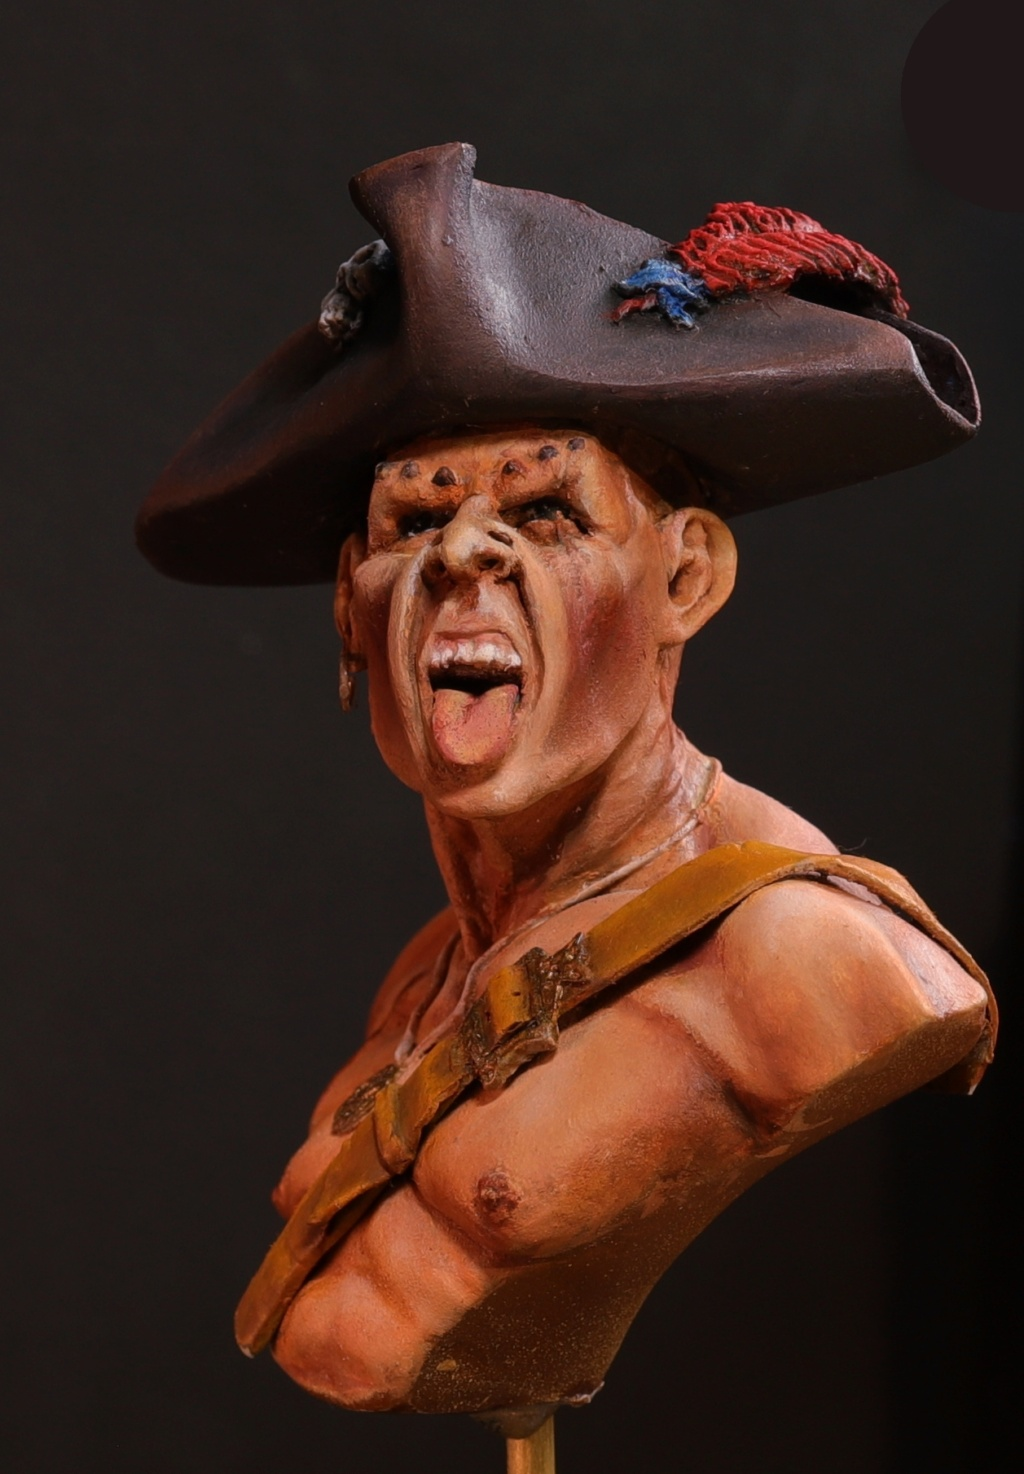 Pirate des caraïbes - Définitif Pirate20